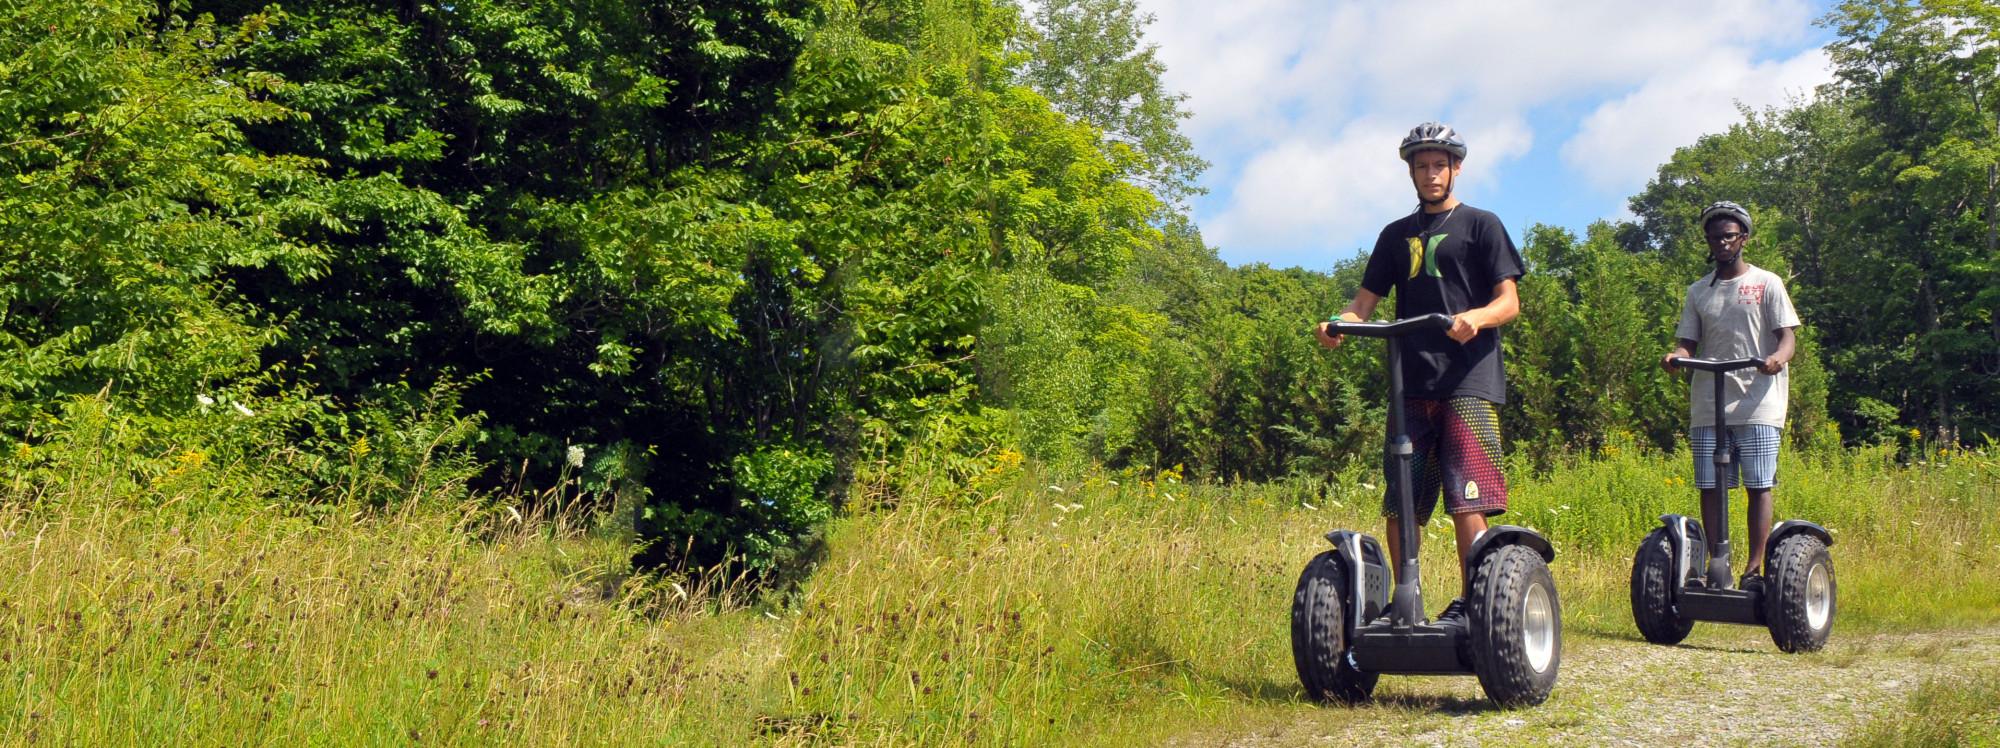 Seg Rides of Vermont